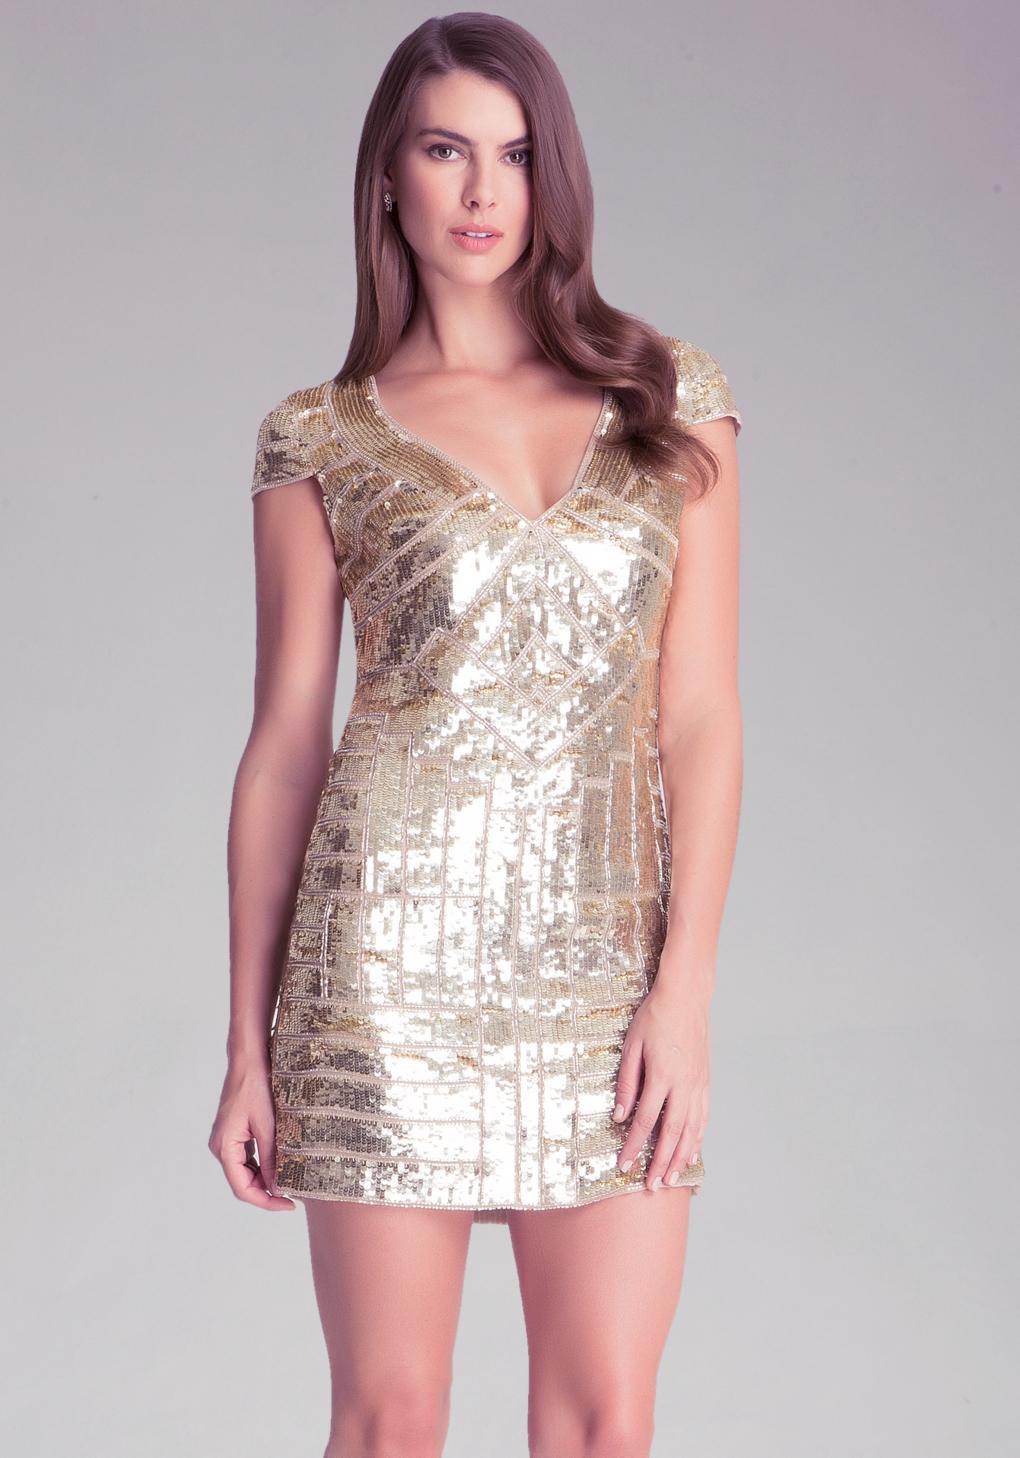 8a230ef201 Gallery. Women s Cowl Back Dresses Women s V Neck Sequin ...